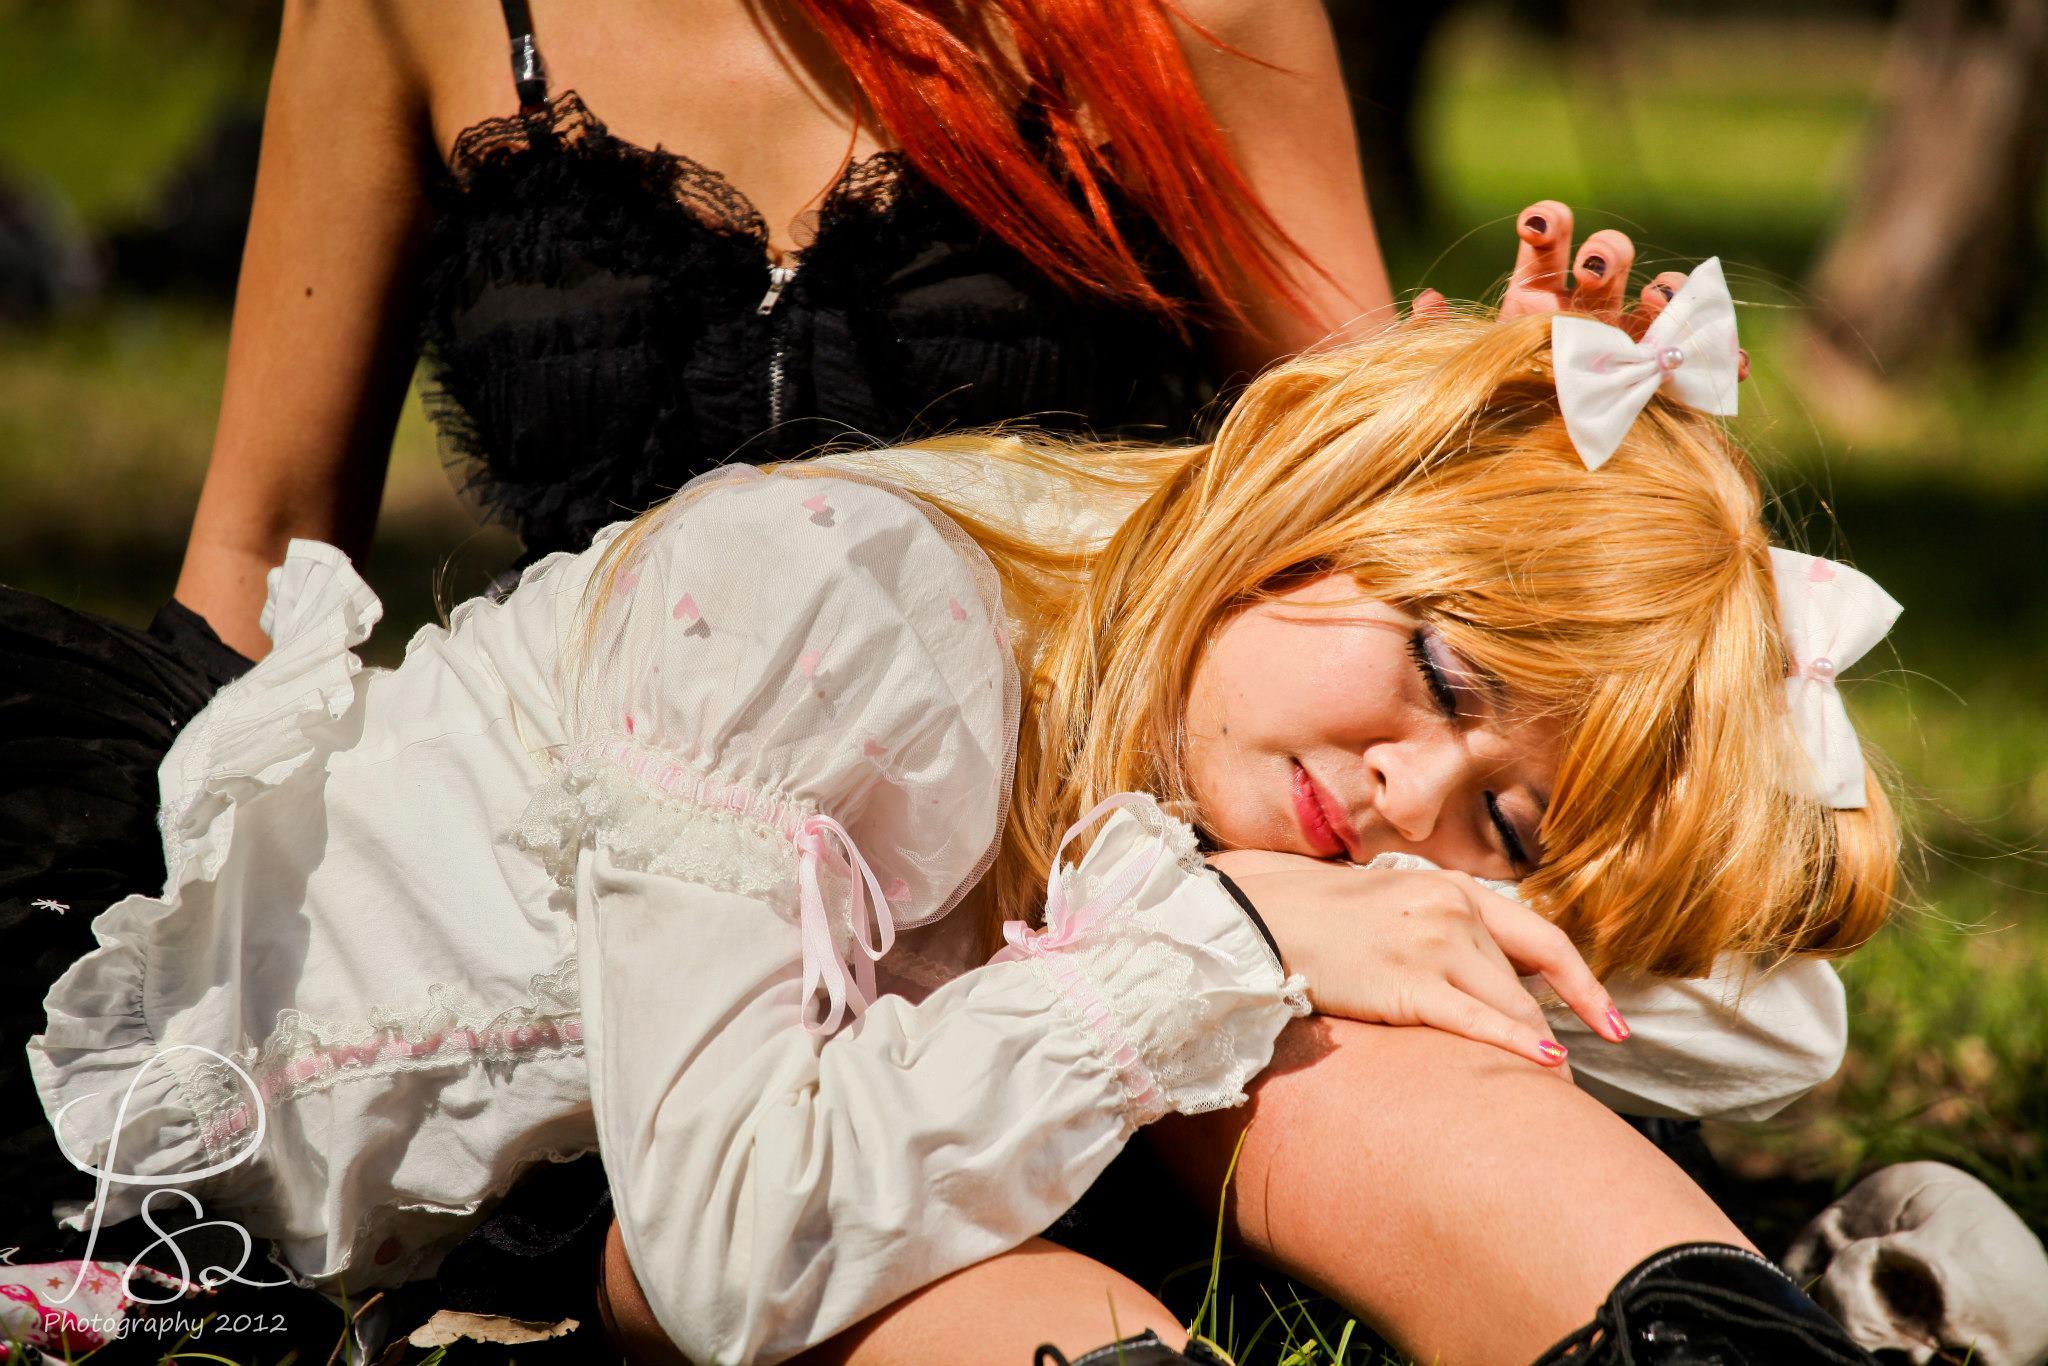 PreciousS2 Lolita 2